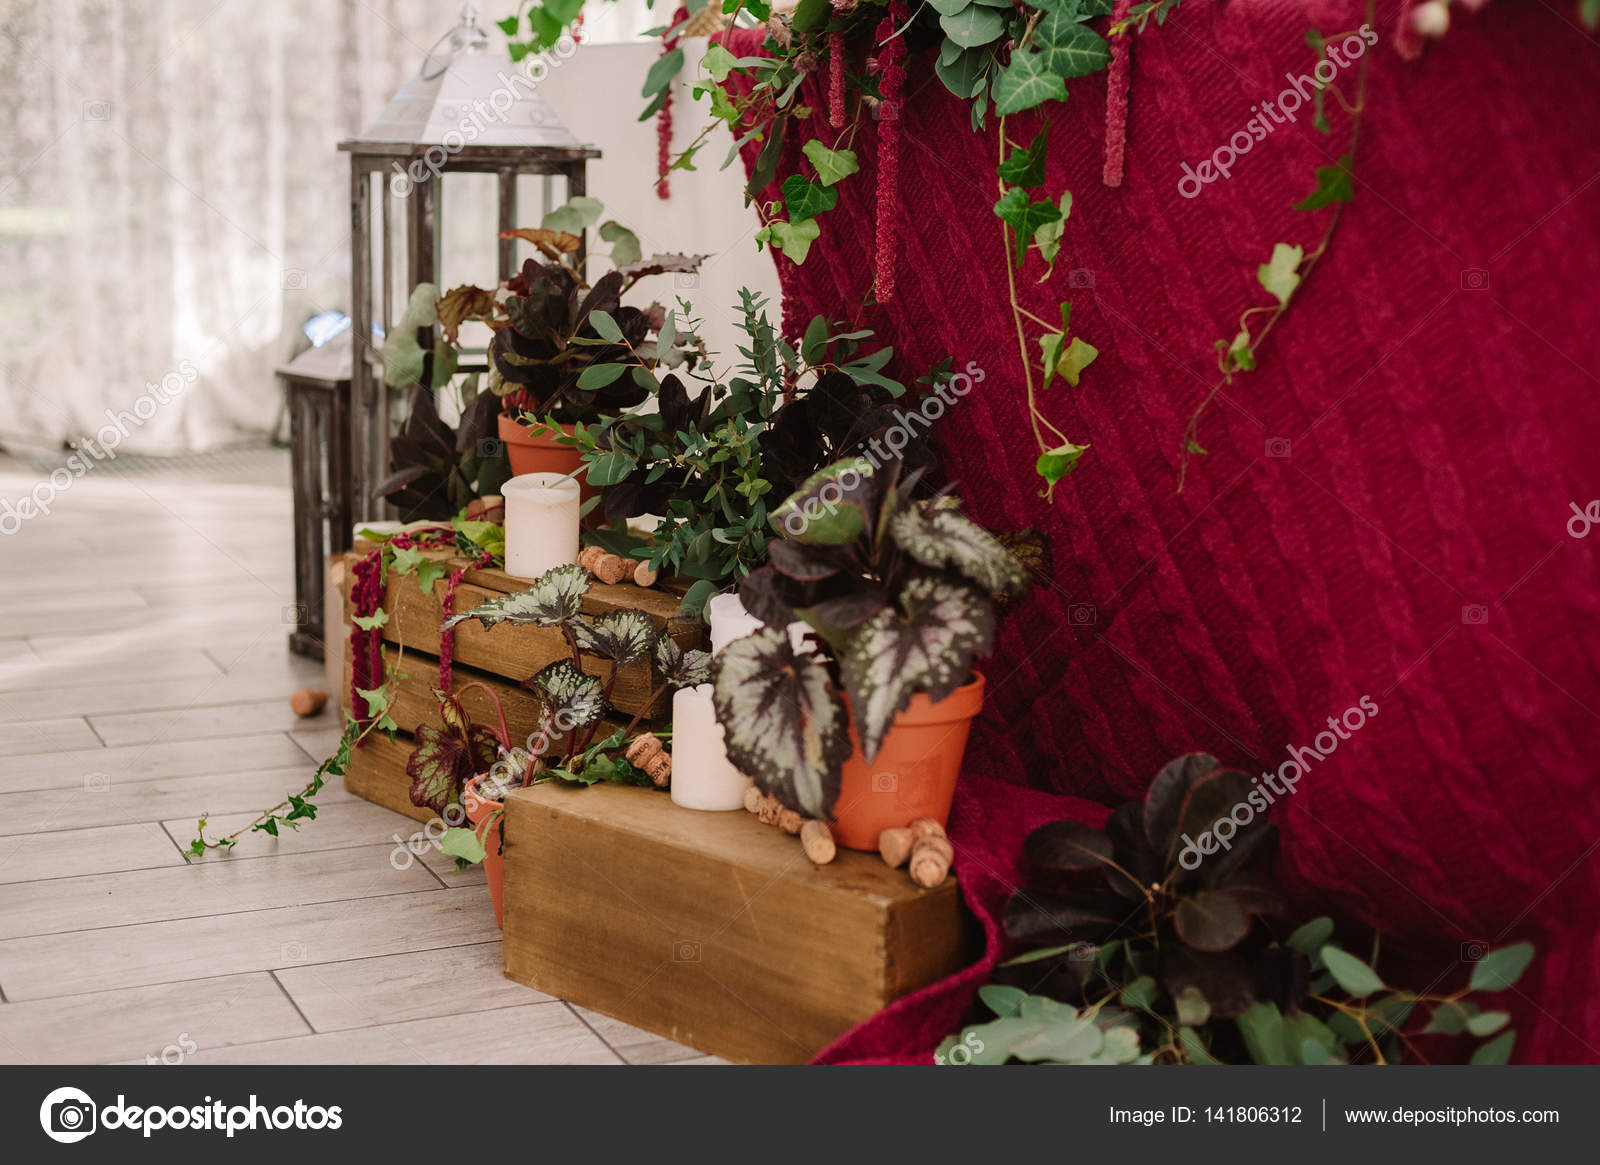 Wedding Decoration Of The Restaurant In Rustic Style Stock Photo C Olgaburtseva 141806312